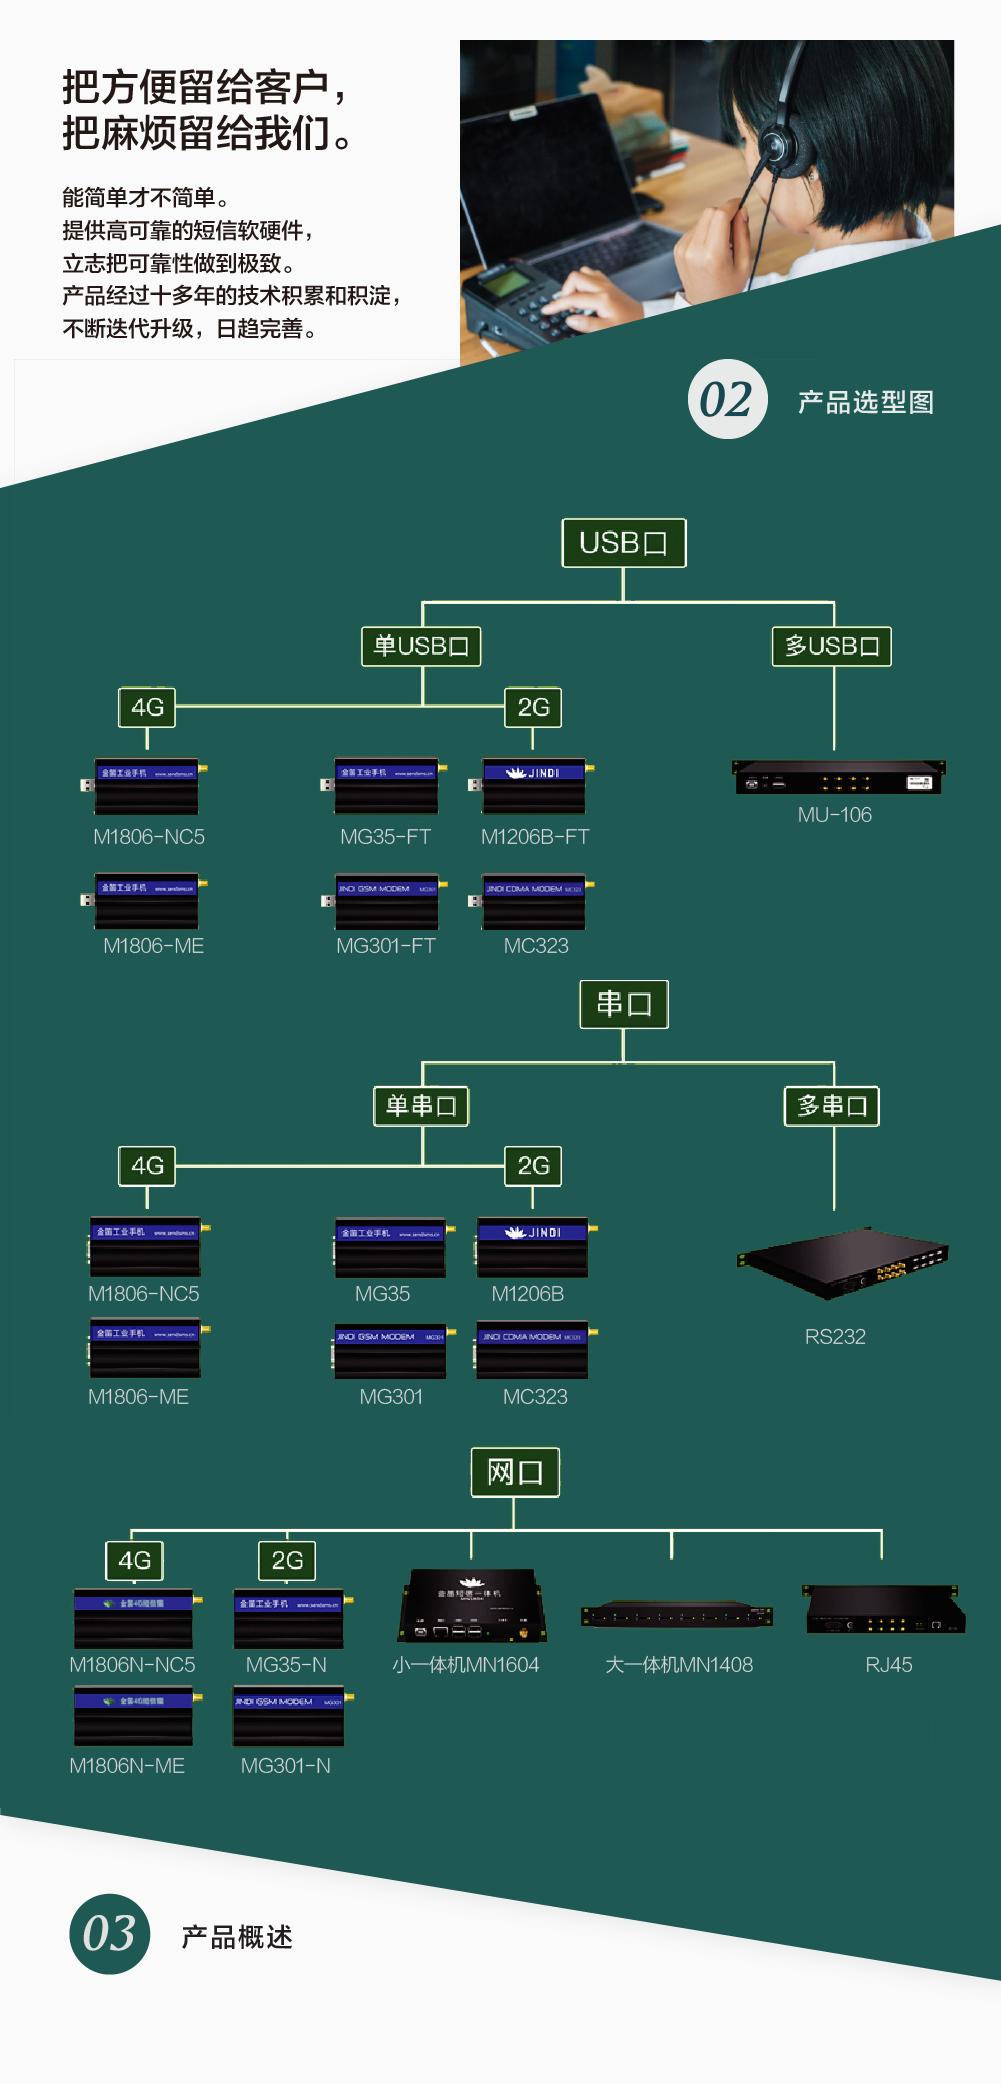 M1806-ME_2